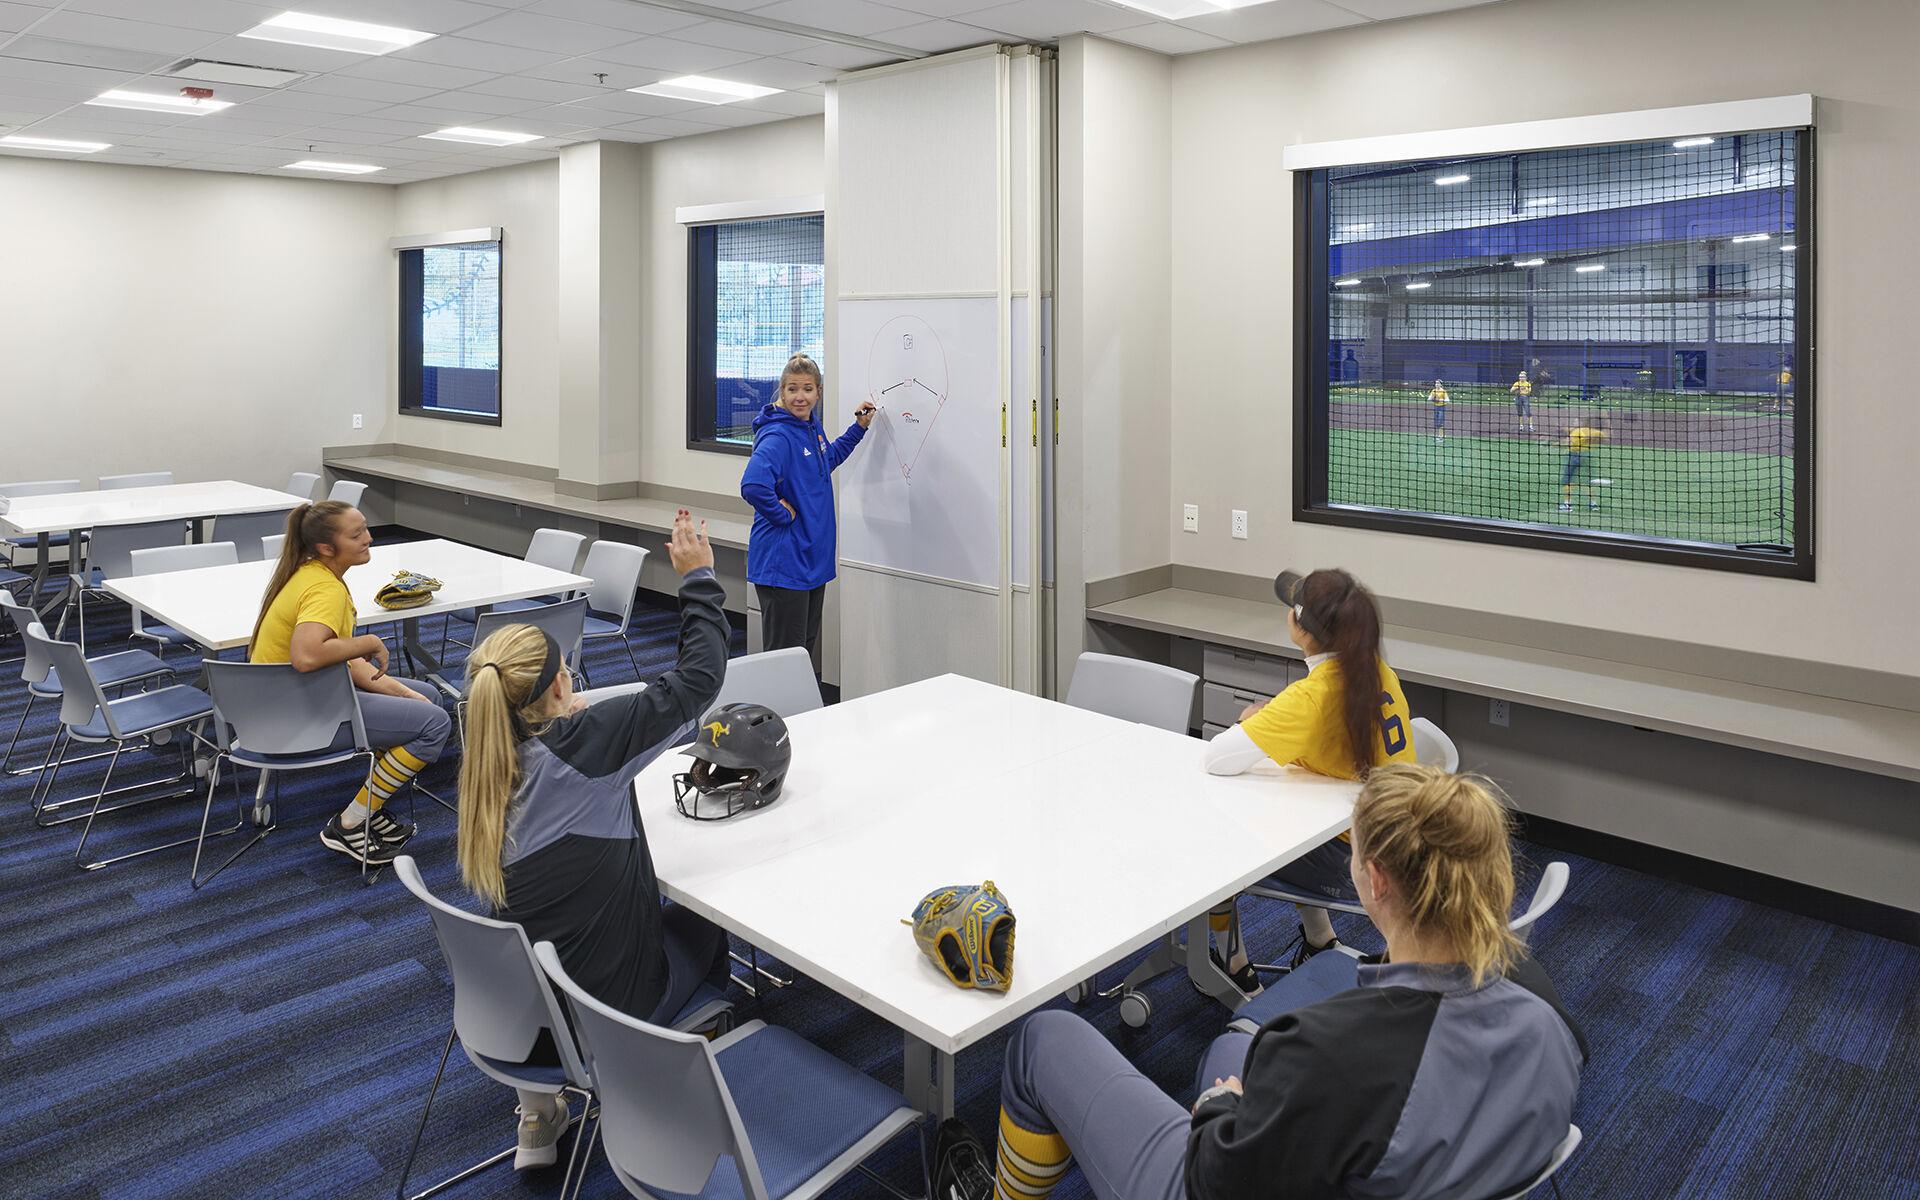 Kansas City MLB Urban Youth Academy - Kansas City Royals